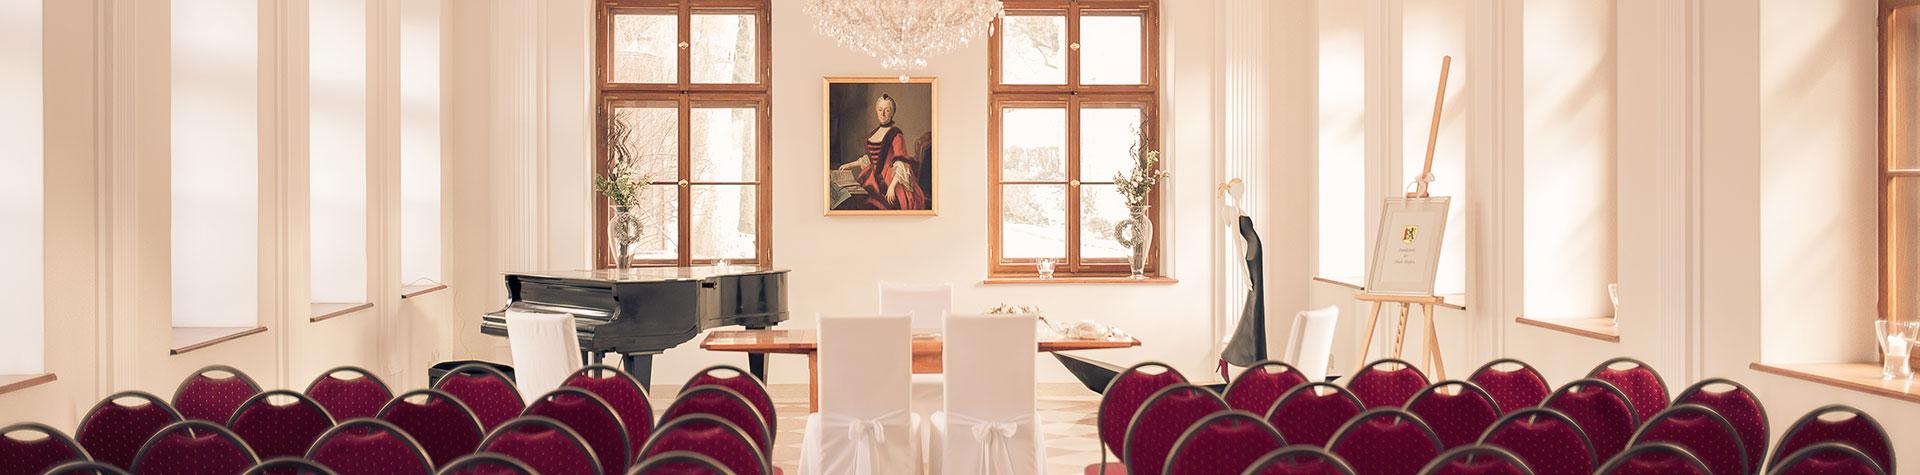 Schloss Proschwitz - Festsaal